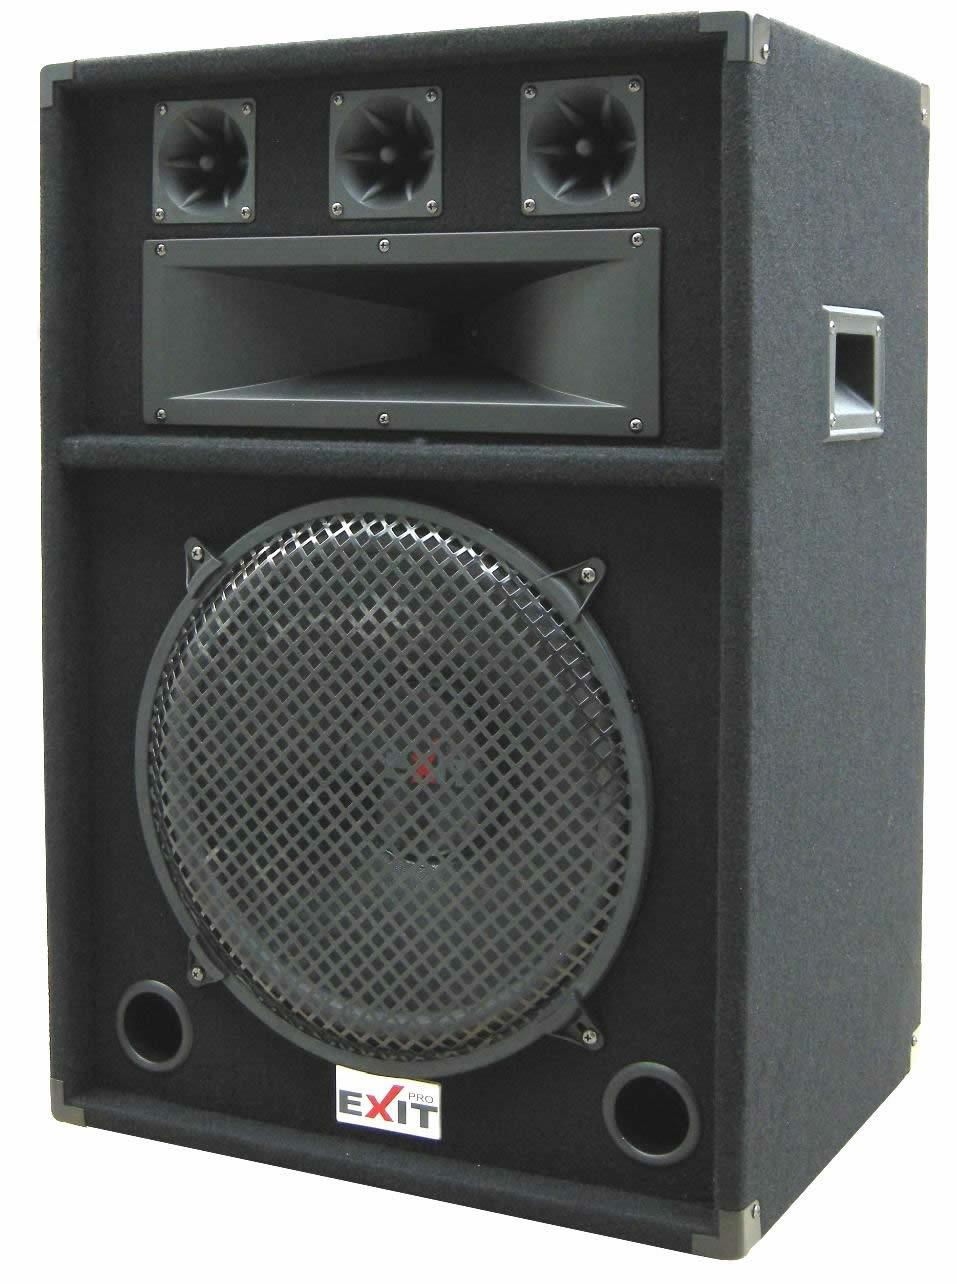 Exit Pro Dj 115 Speaker Cabinet Product On